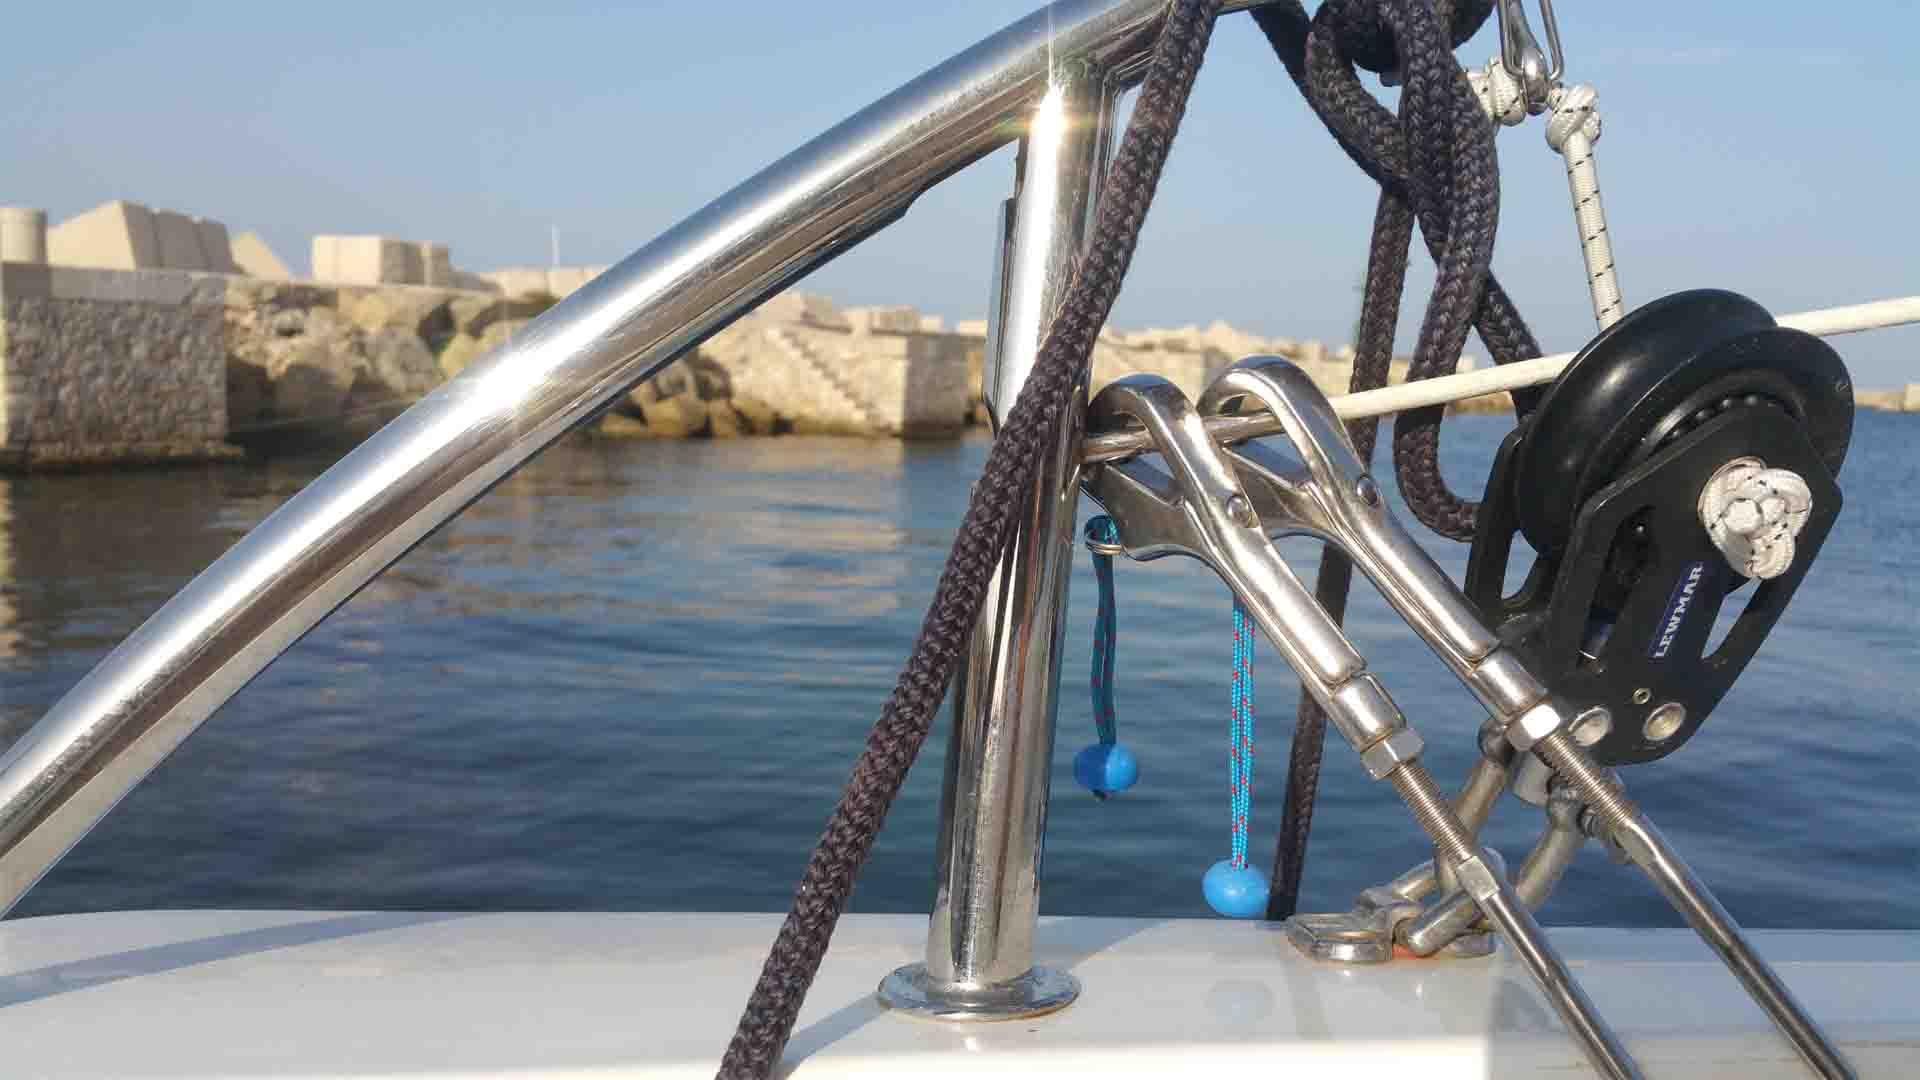 Marsala porto cromatura periplo Sicilia Fontaine Pajot Saba 50 catamarano barca a vela